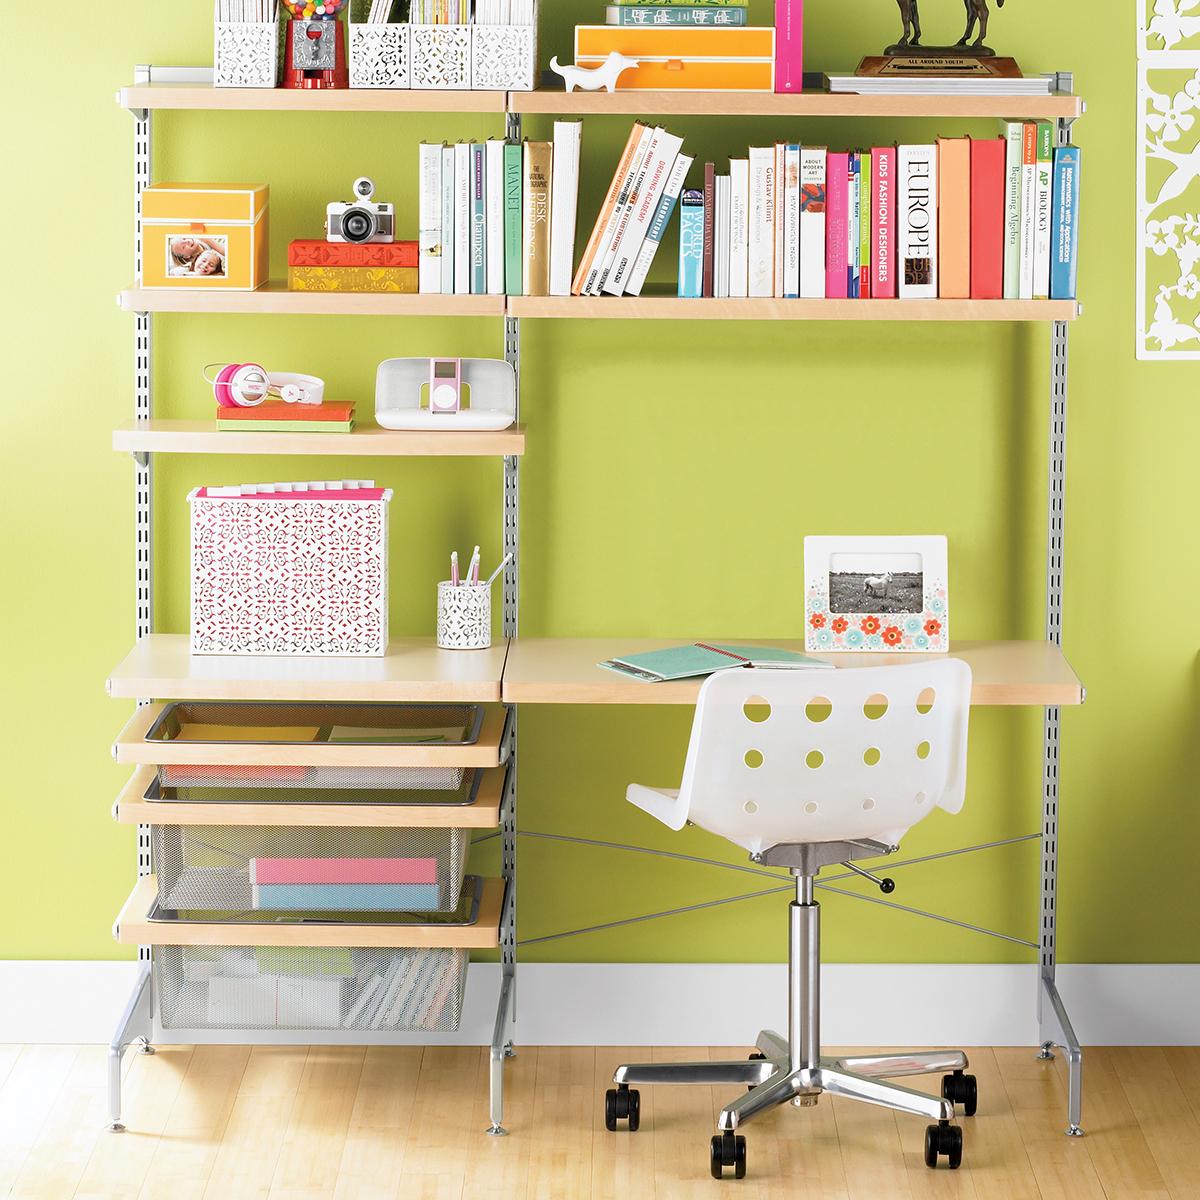 freestanding Study Zone